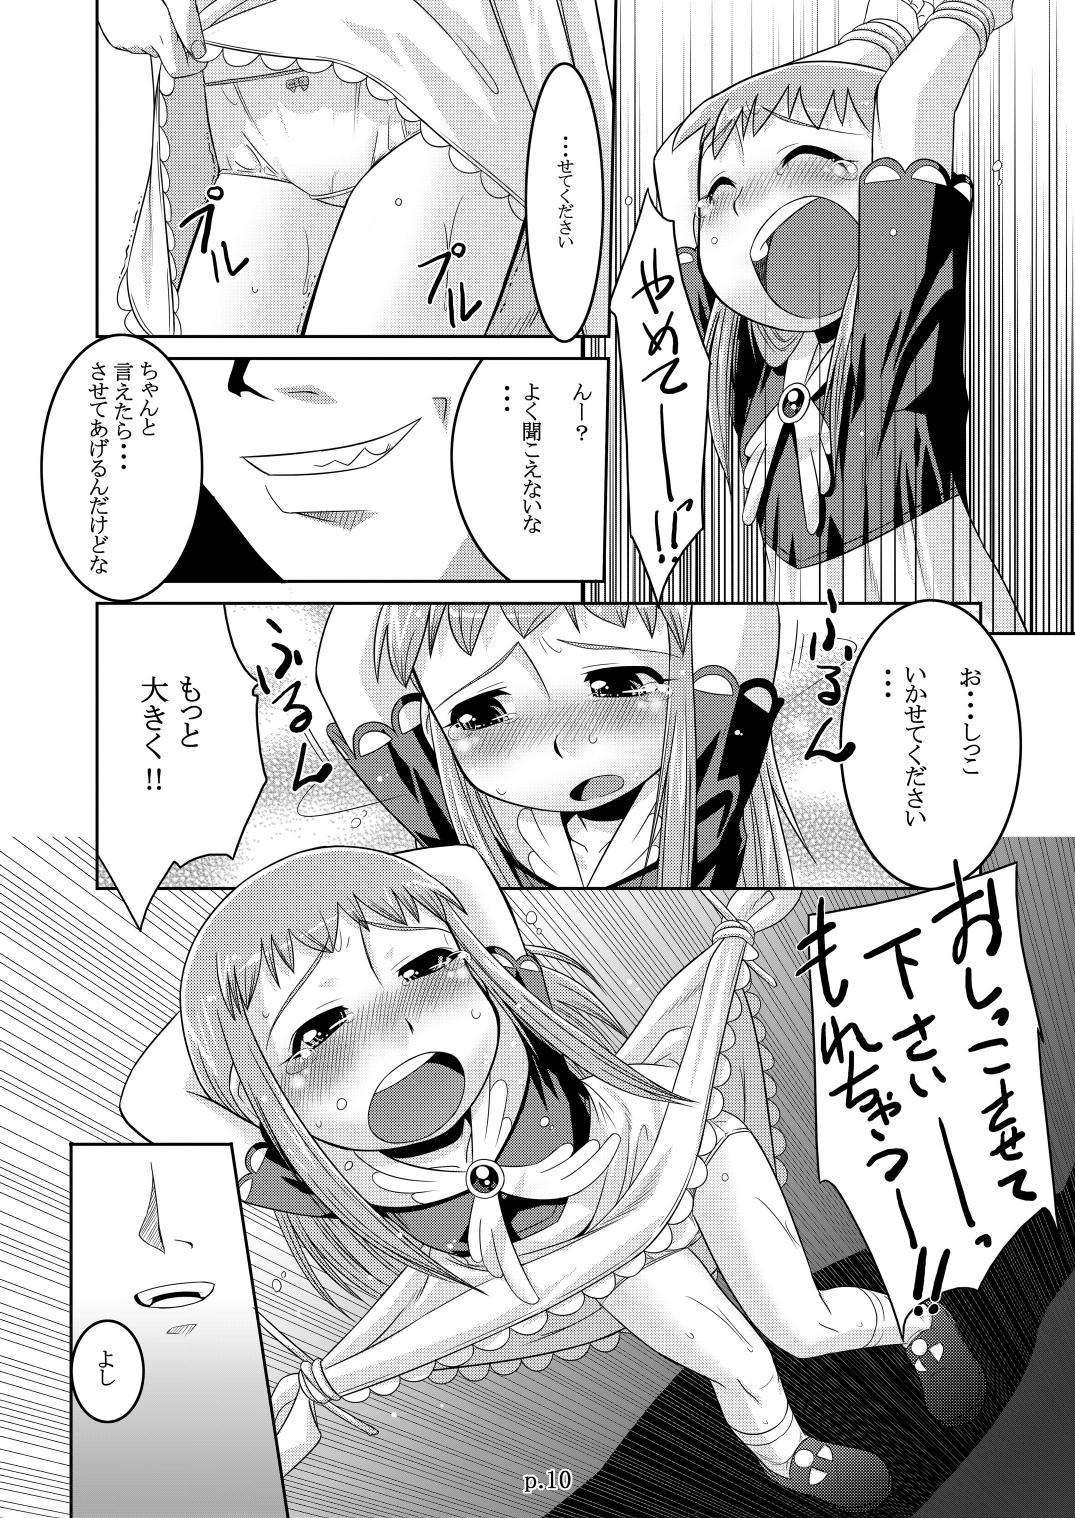 [gyara cter (bee)] Tio hon+ (Konjiki no Gash!! [Zatch Bell!]) dl version 9